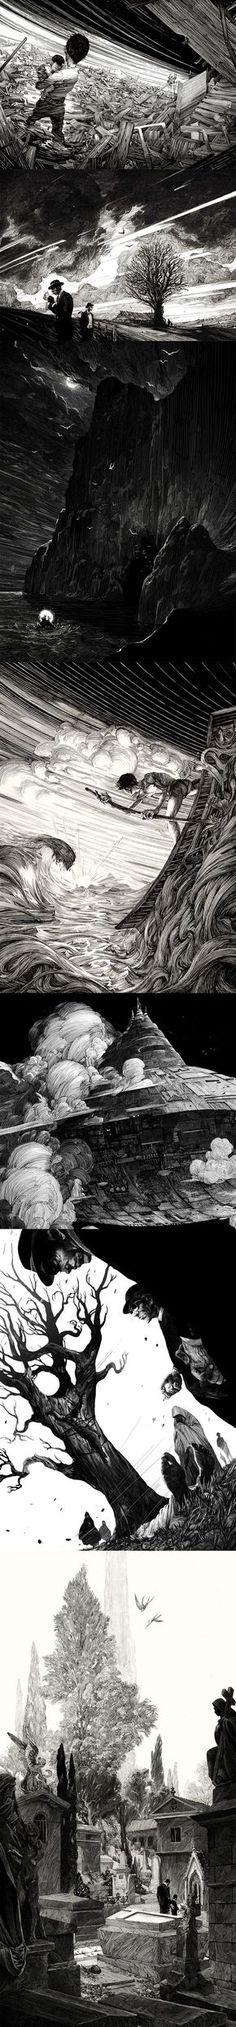 Ink work by Nico Delort